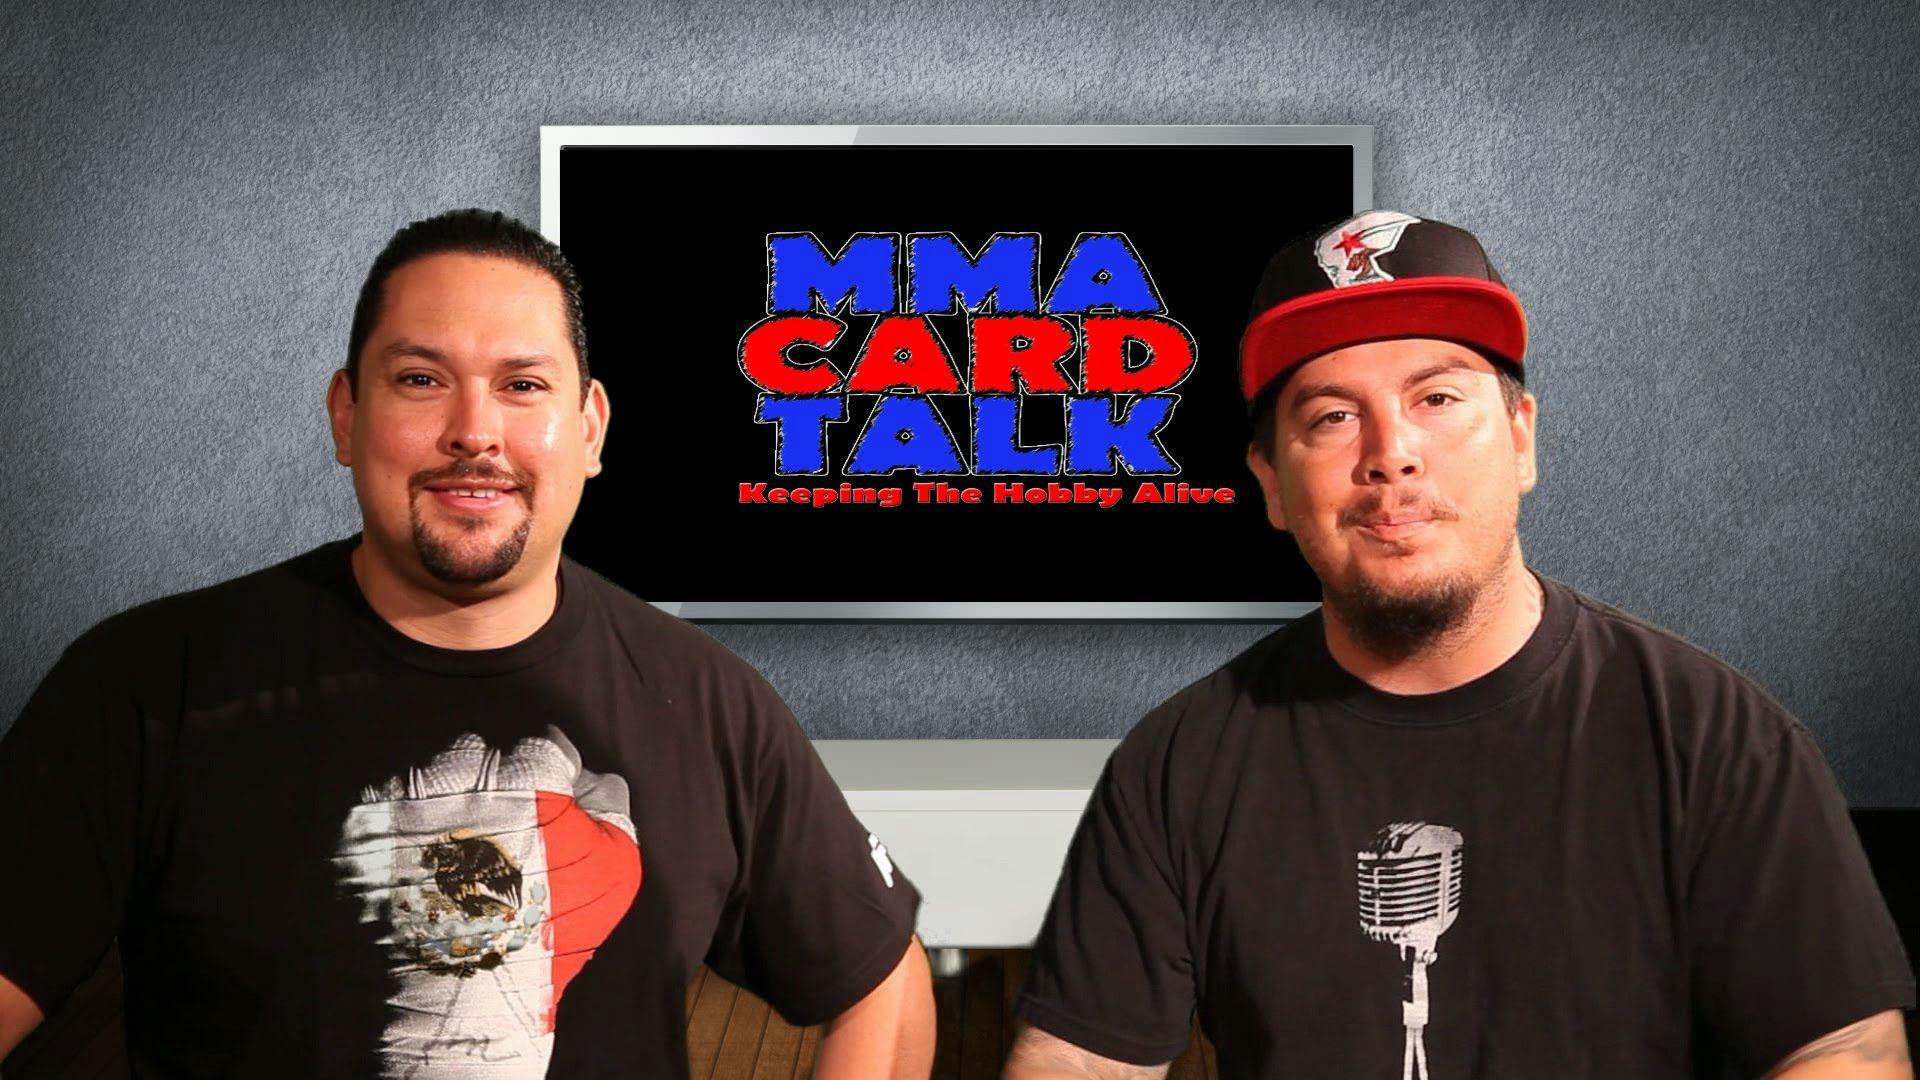 MMA Card Talk Episode 3